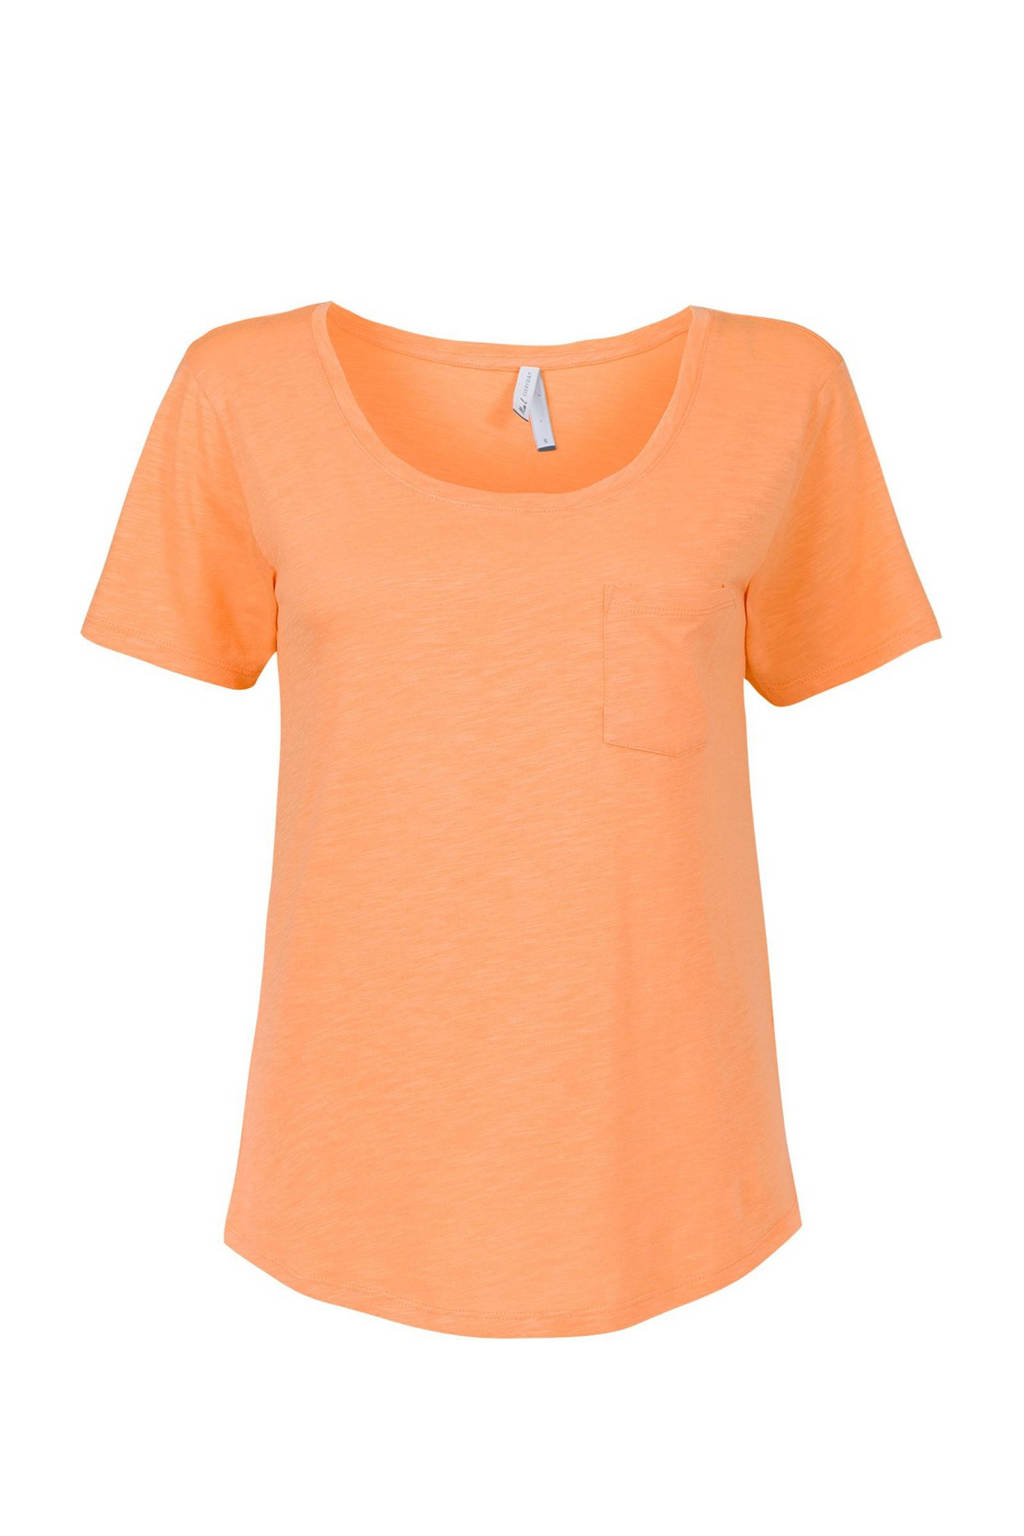 Miss Etam Regulier T-shirt oranje, Oranje